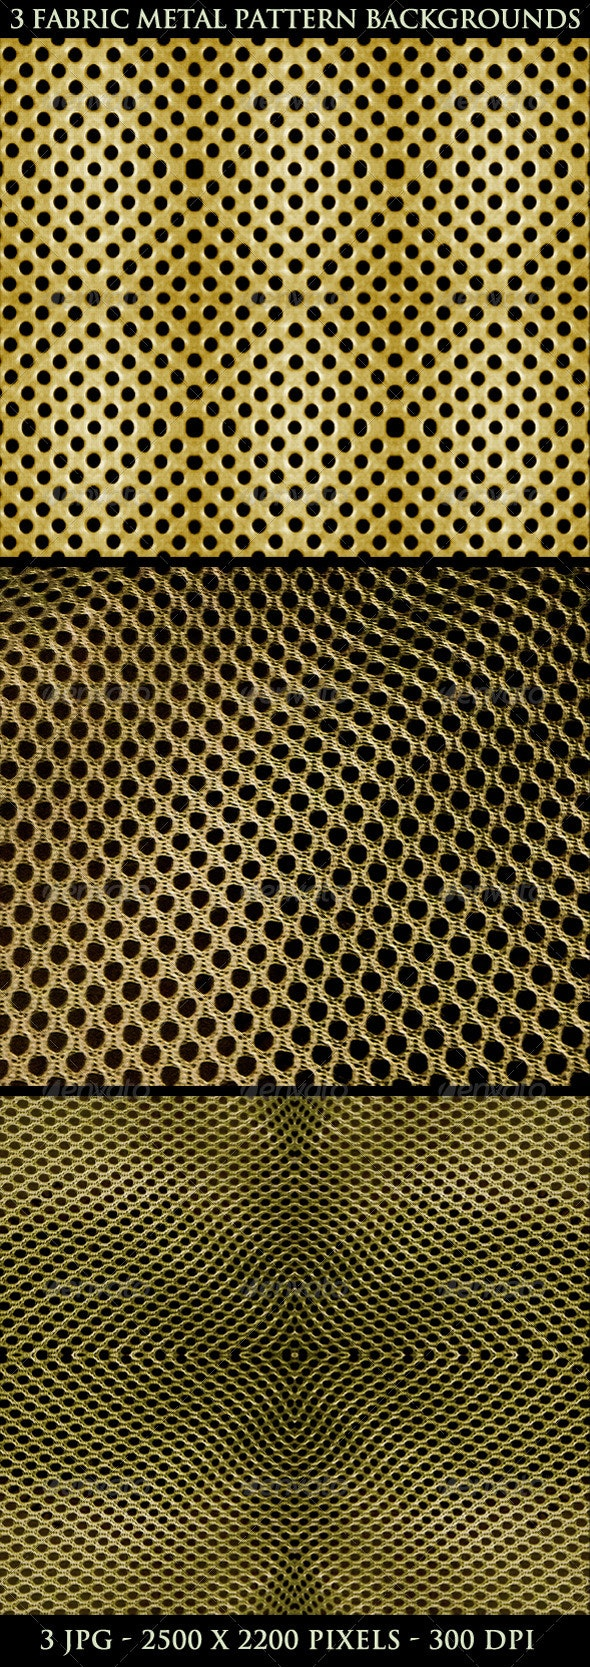 3 Fabric Metal Pattern Background